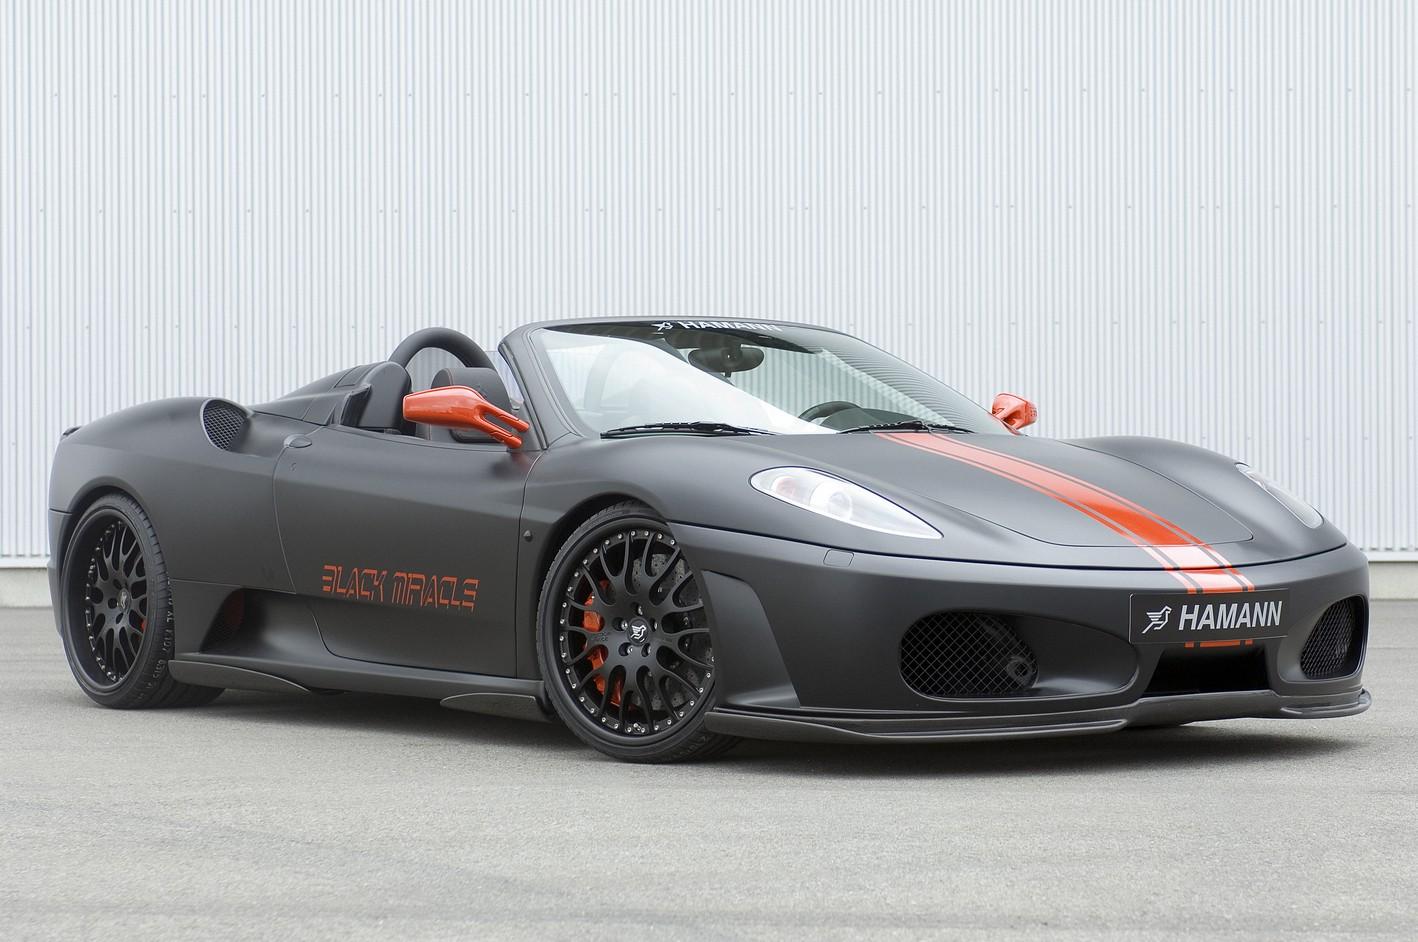 S0-Salon-de-Francfort-Ferrari-F430-Spider-Black-Miracle-by-Hamann-81886